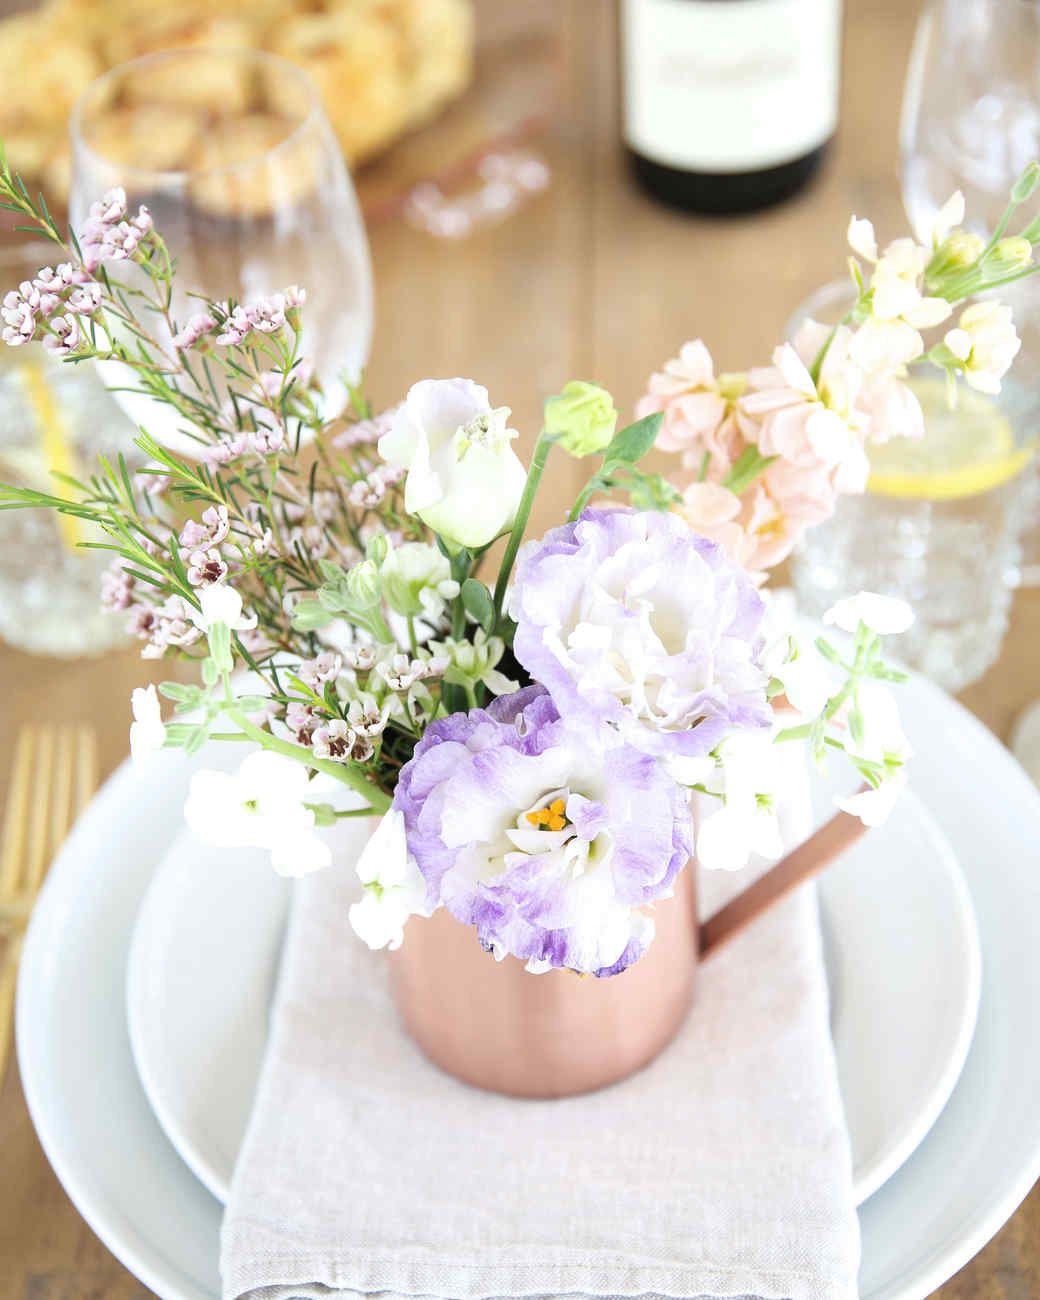 easter-flowers-place-setting-arrangements.jpg